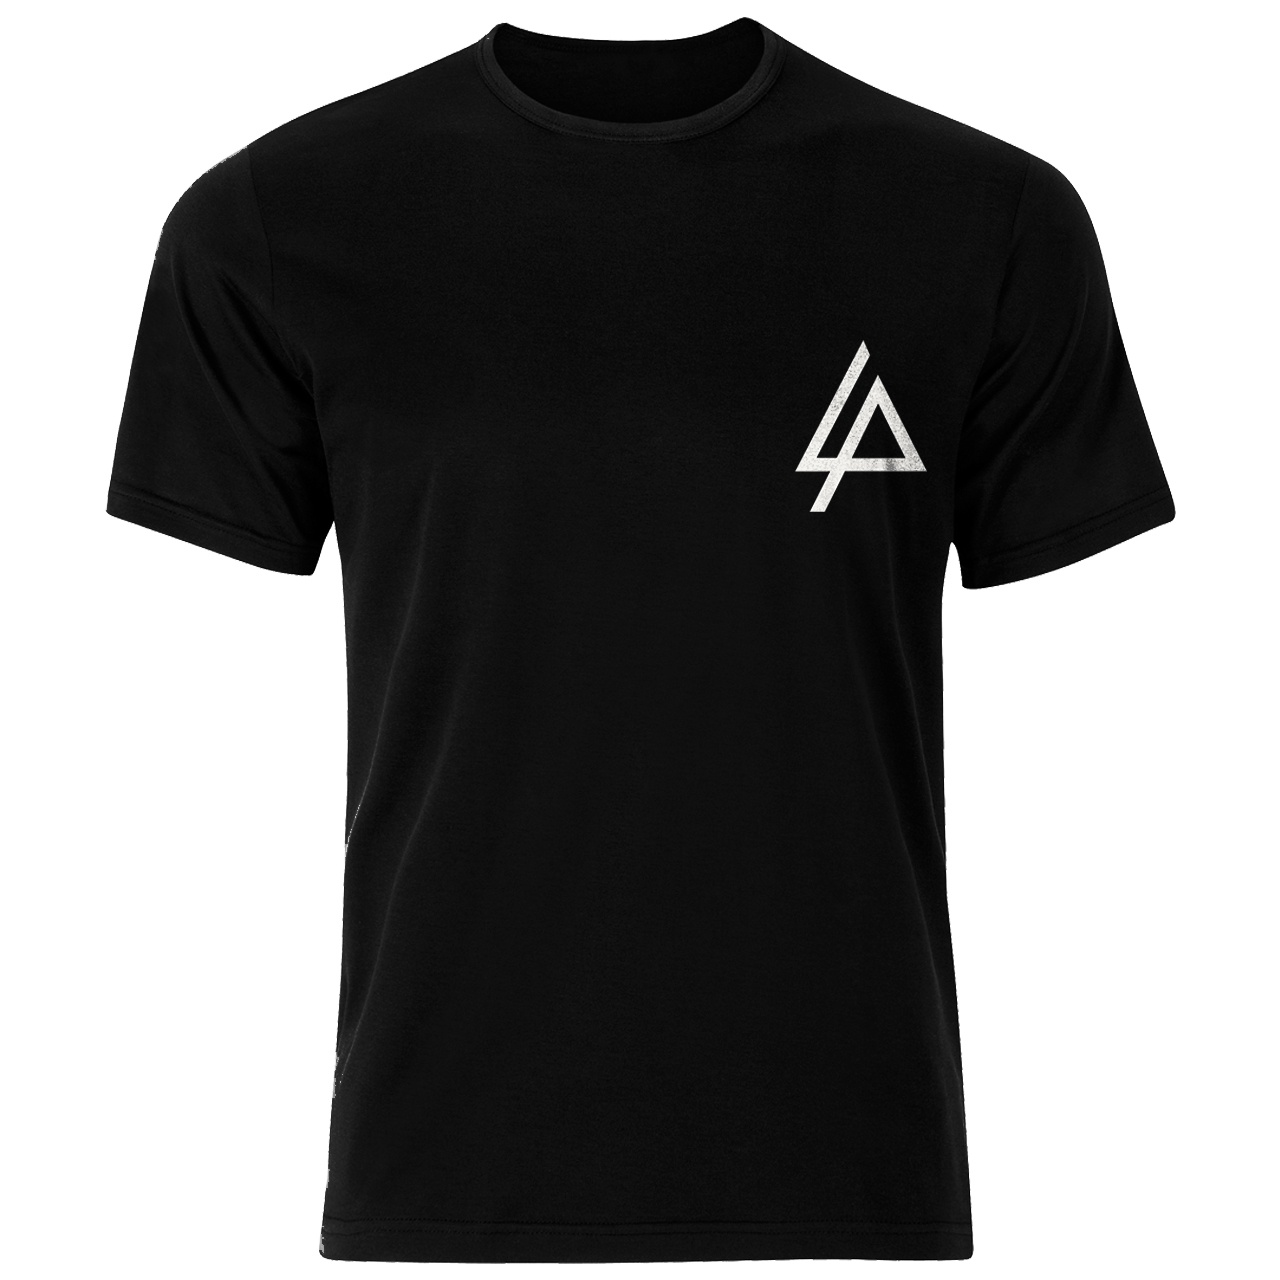 تی شرت مردانه فلوریزا طرح گروه موزیک لینکین پارک کد Linnkin park 001M